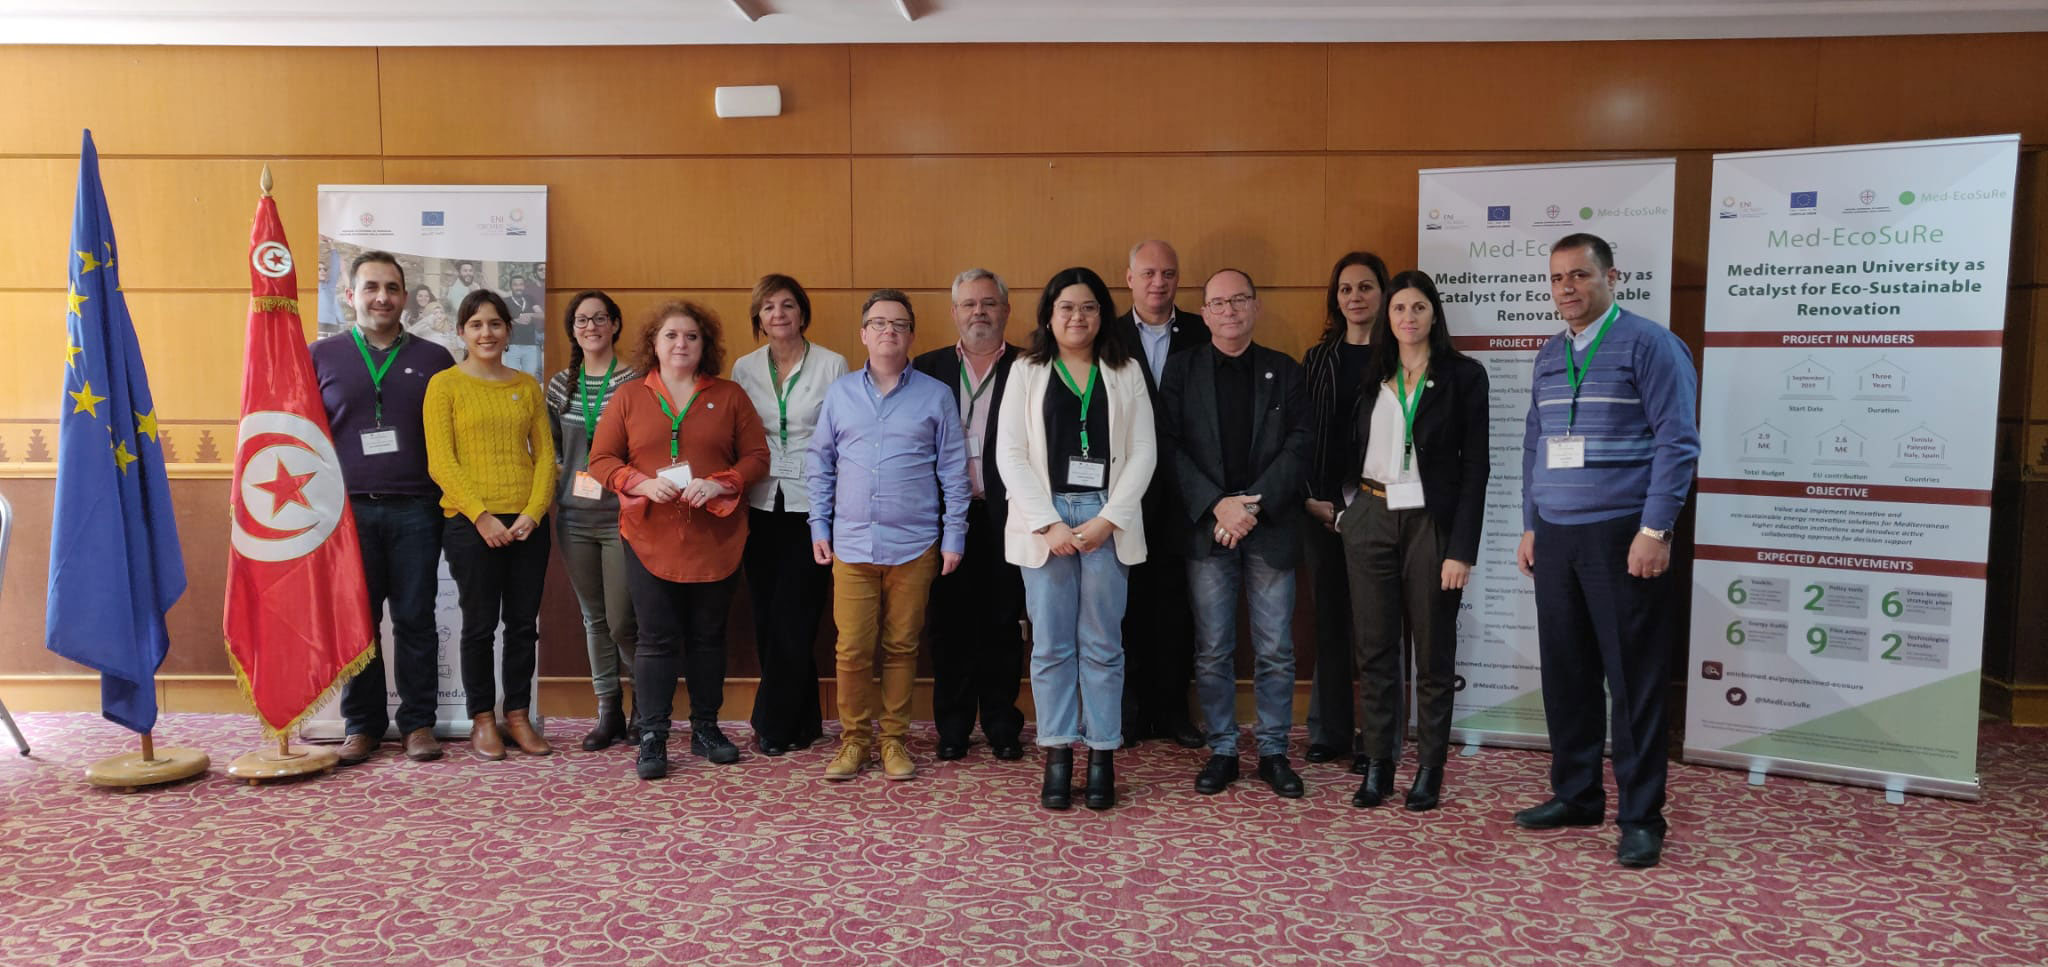 Kick off meeting en Túnez del Proyecto Europeo Med-EcoSuRe